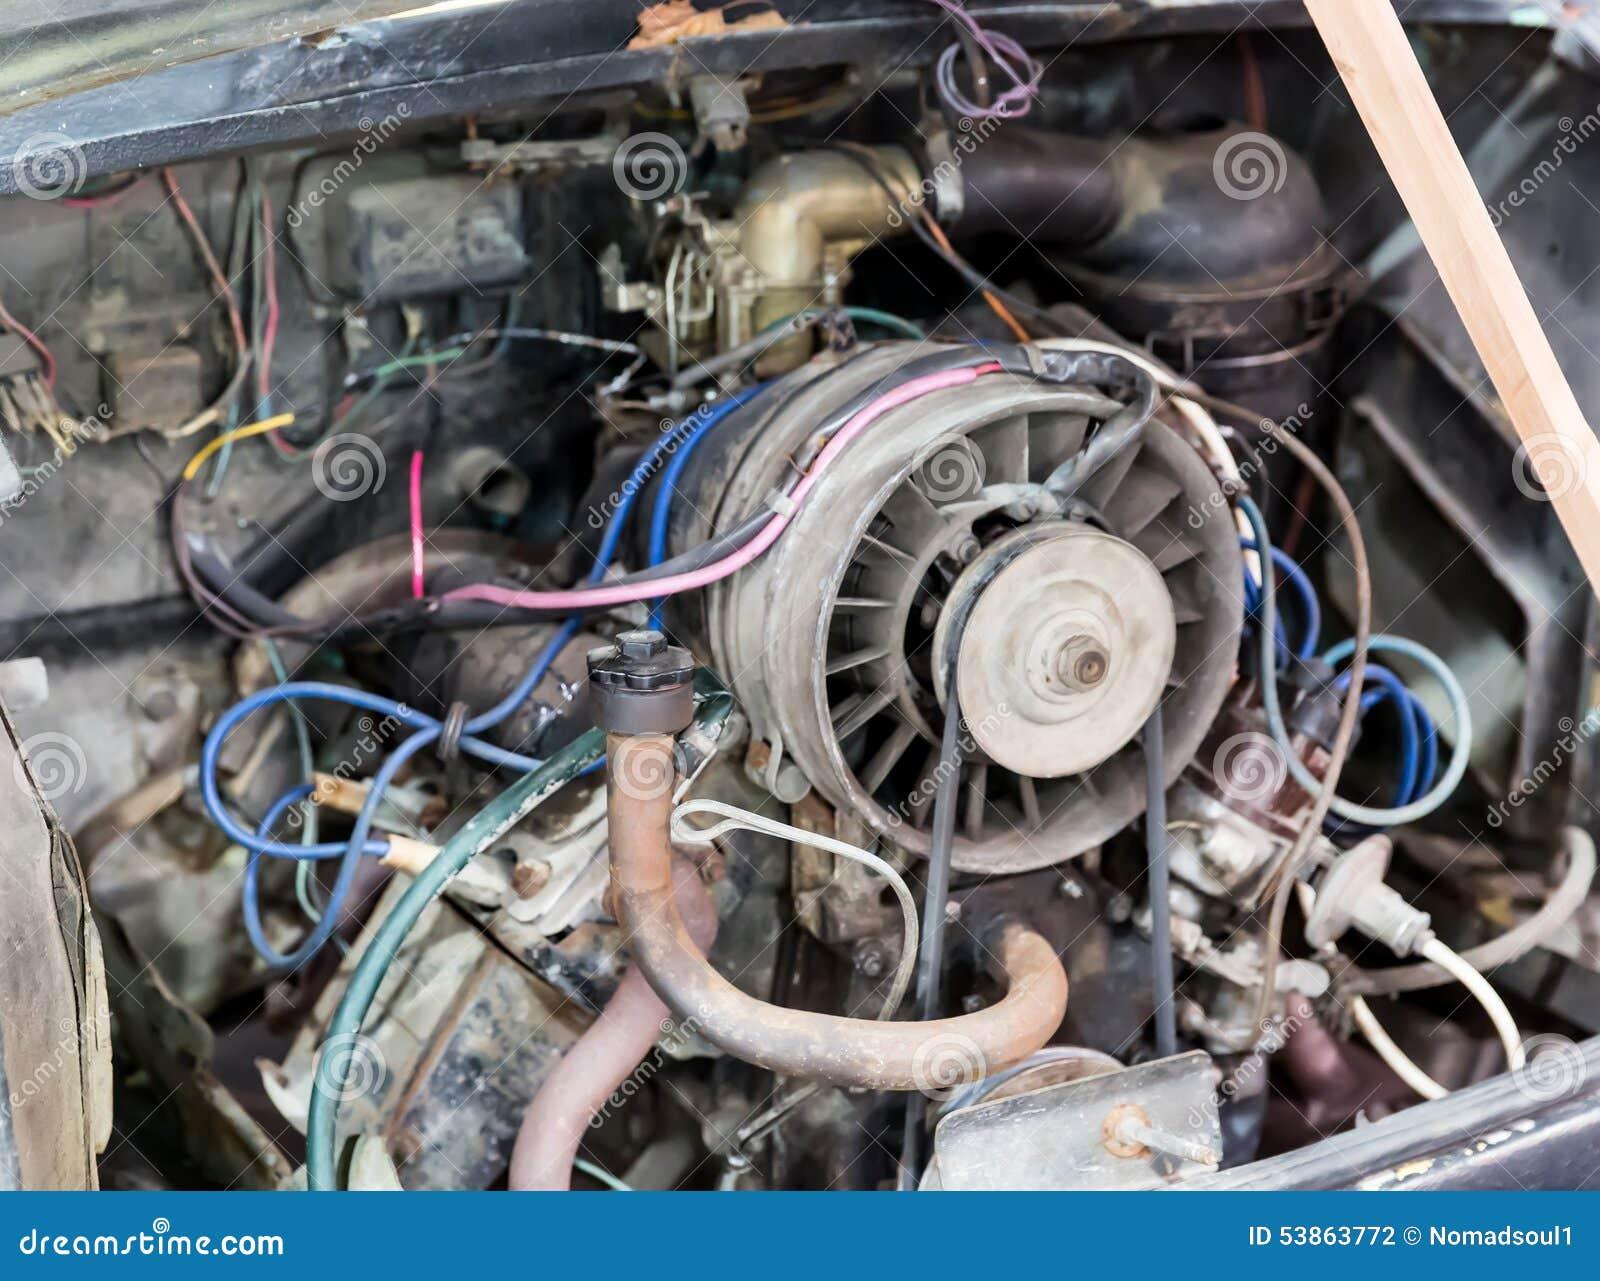 Tolle Beschrifteter Automotor Fotos - Schaltplan Serie Circuit ...